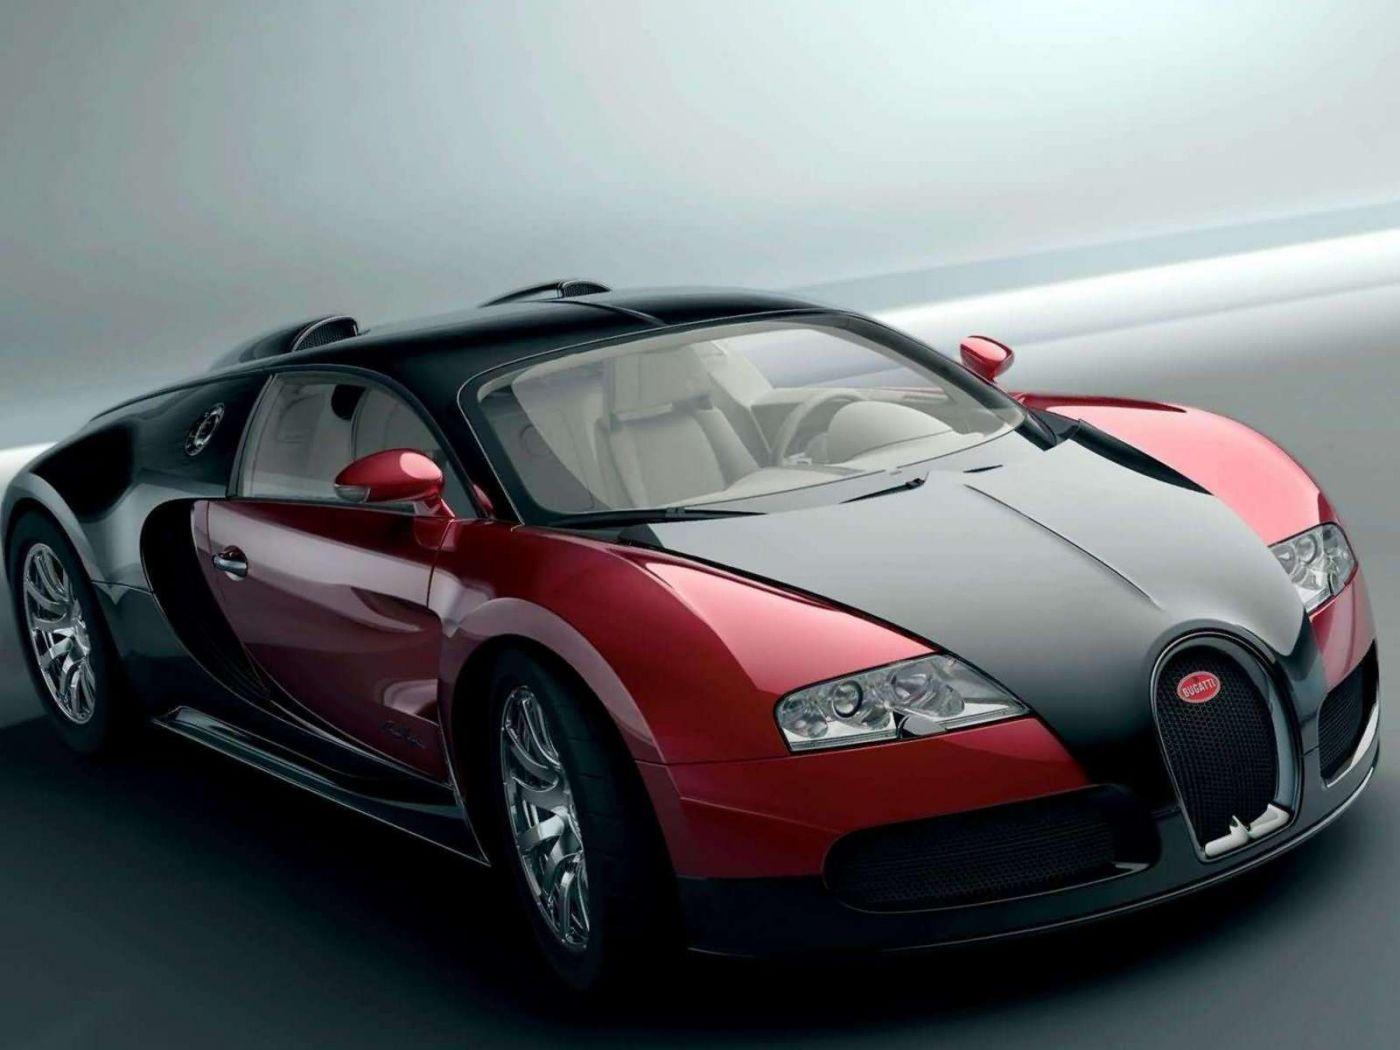 Bugatti Veyron Wallpaper   Supercars Hd Wallpaper 1400x1050